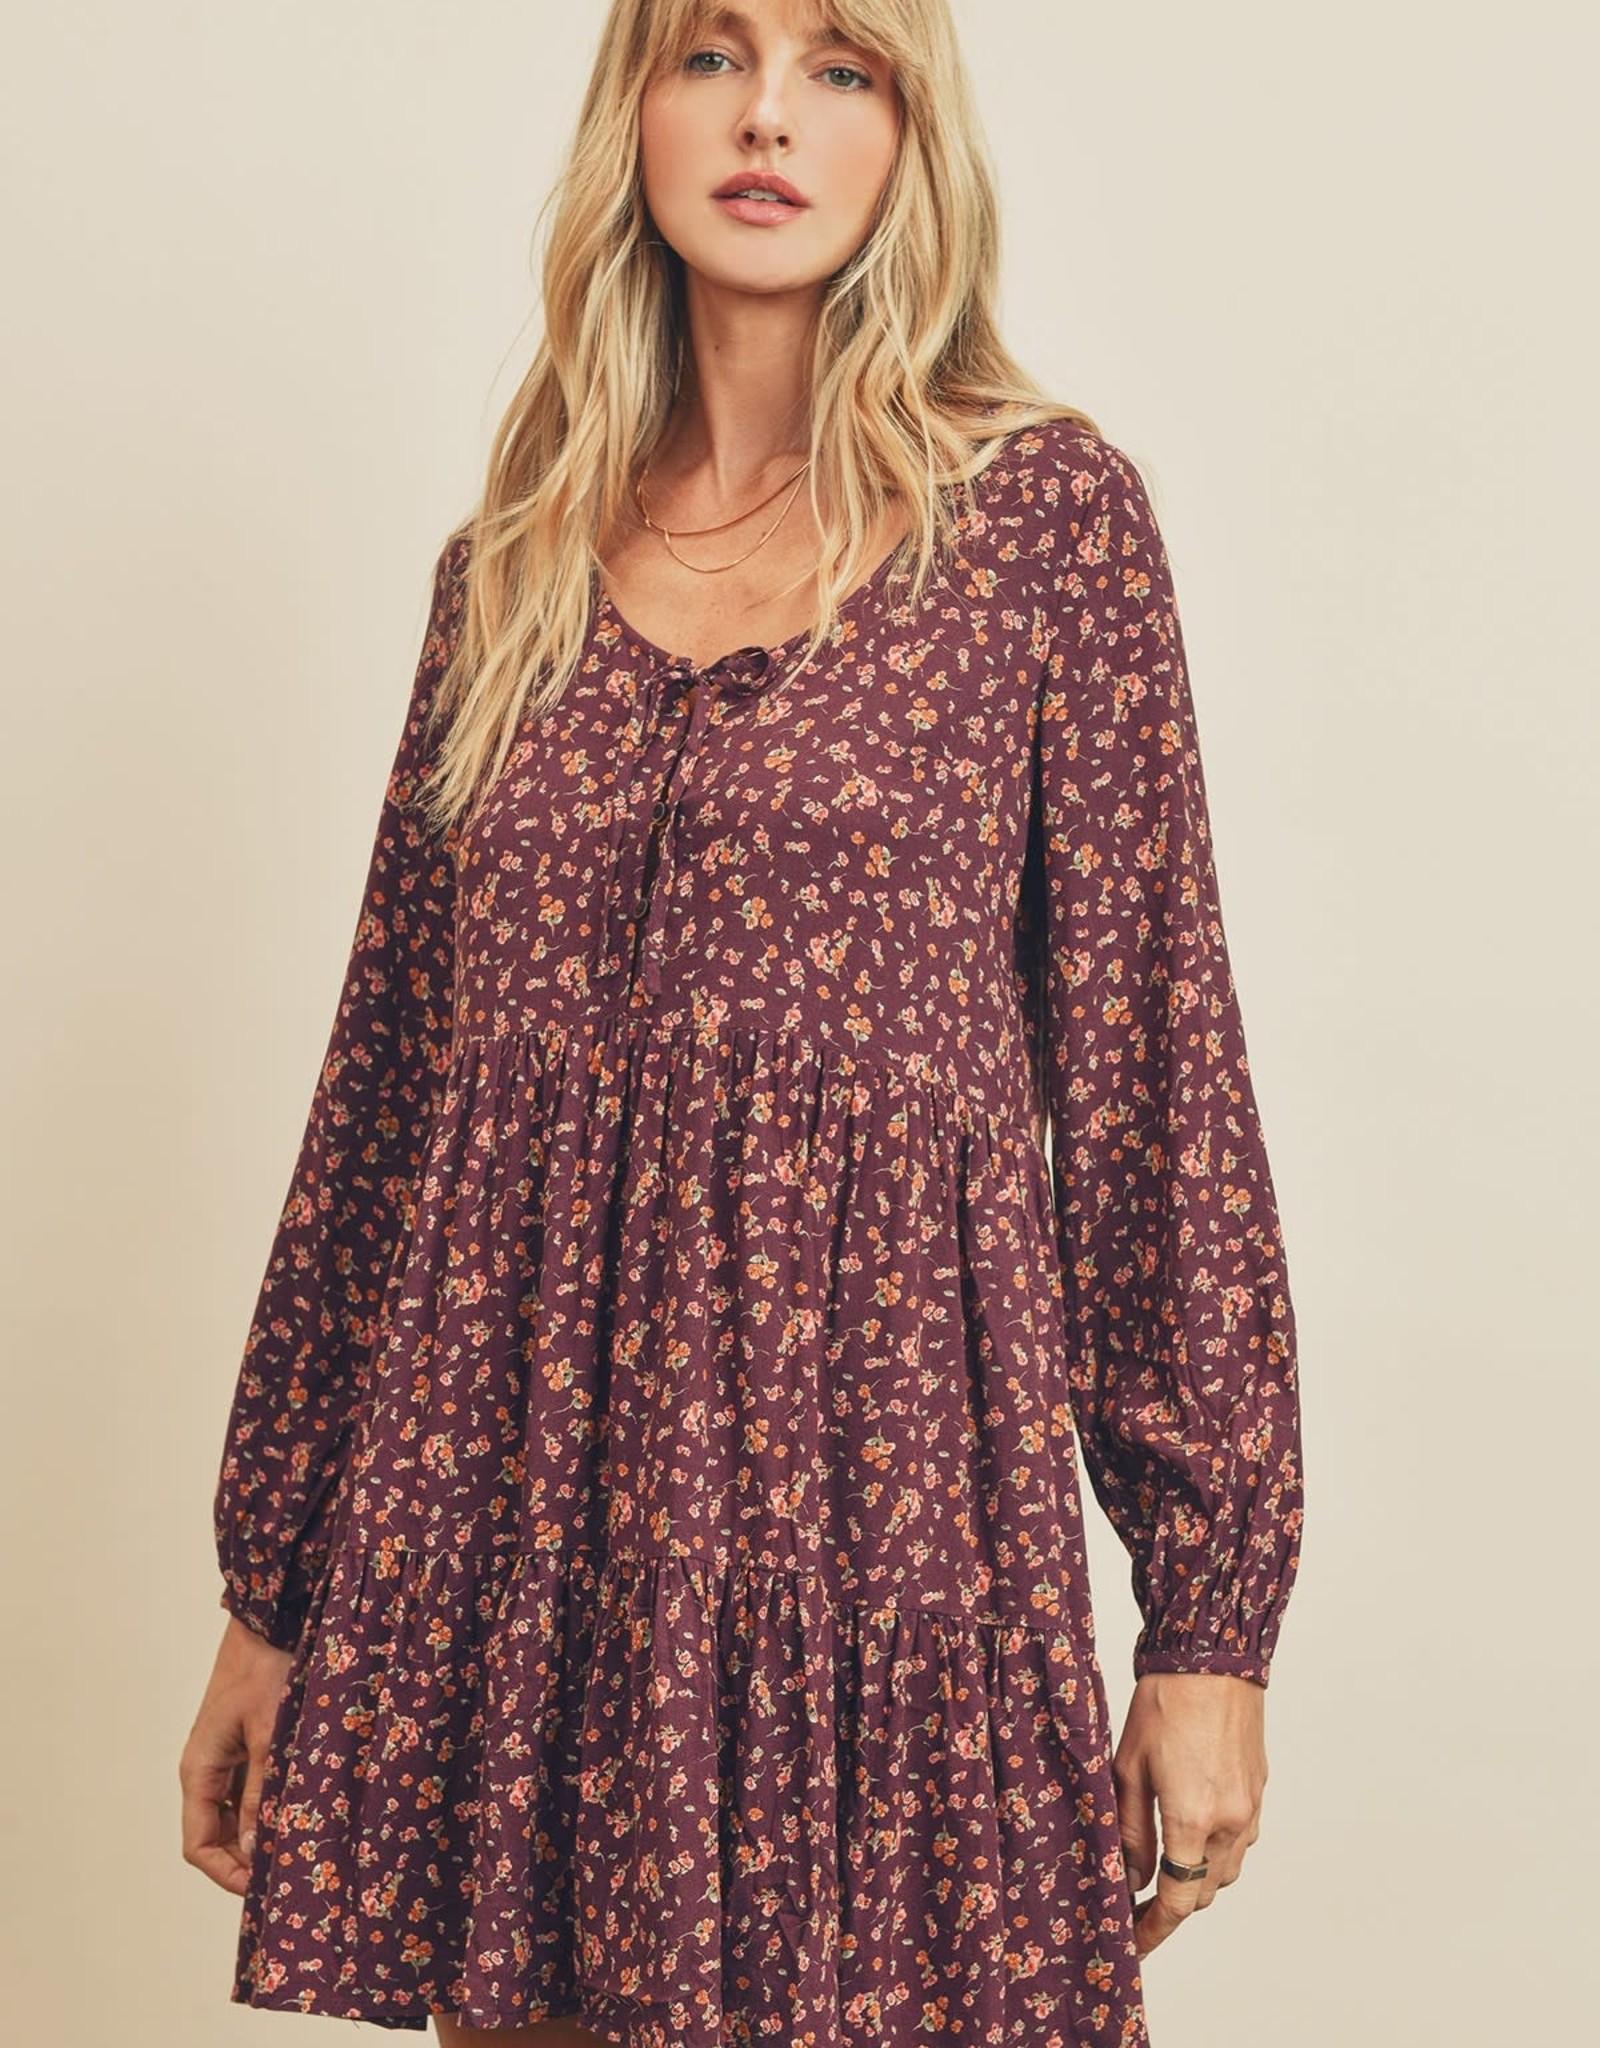 Miss Bliss LS Tiered Swing Dress- Burgundy